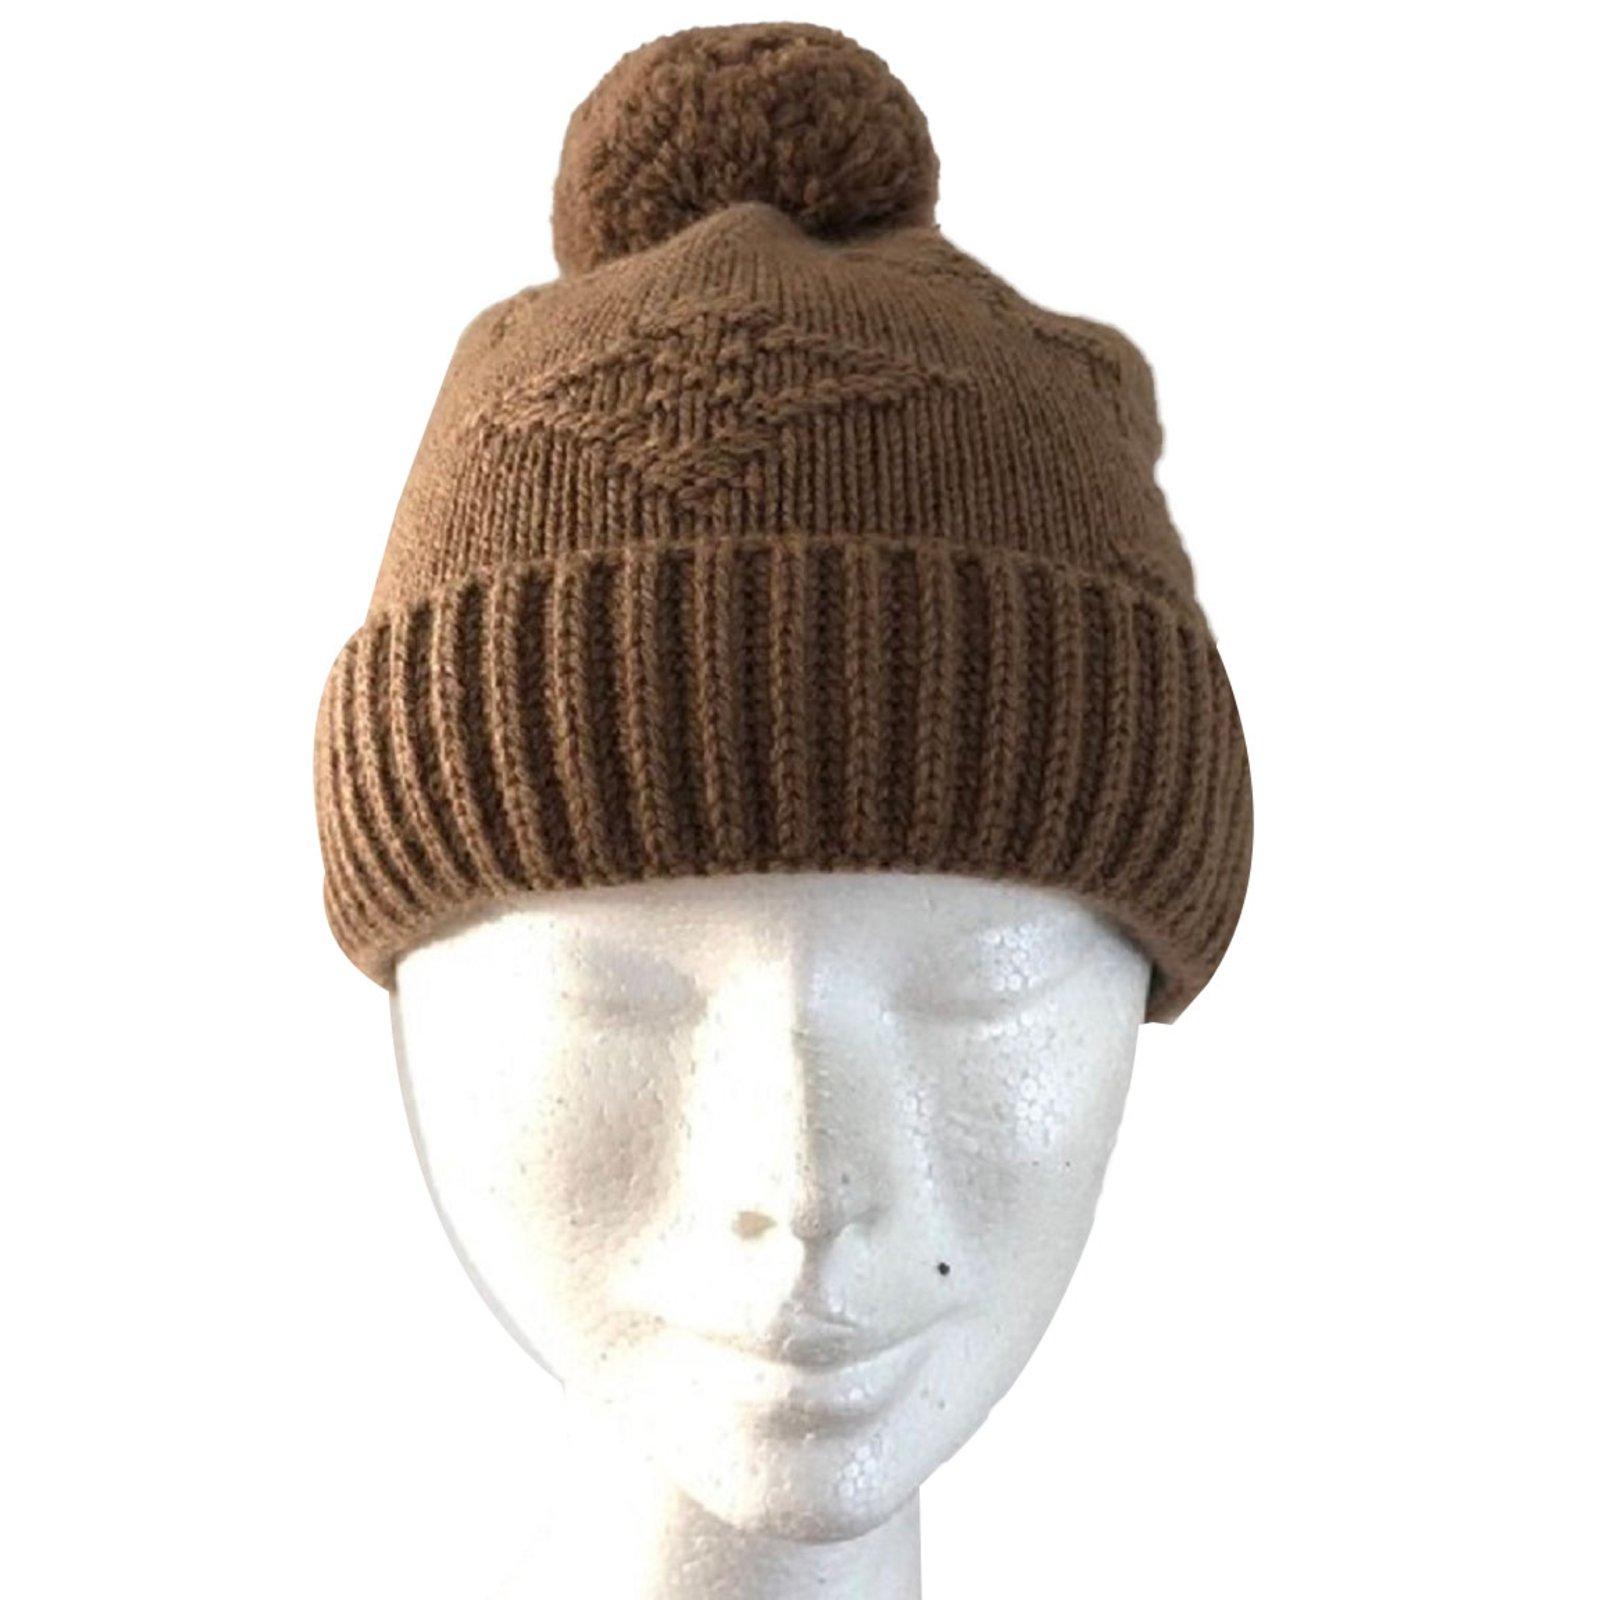 Louis Vuitton cap Hats Cashmere Light brown ref.86159 - Joli Closet 4aebbd8caef